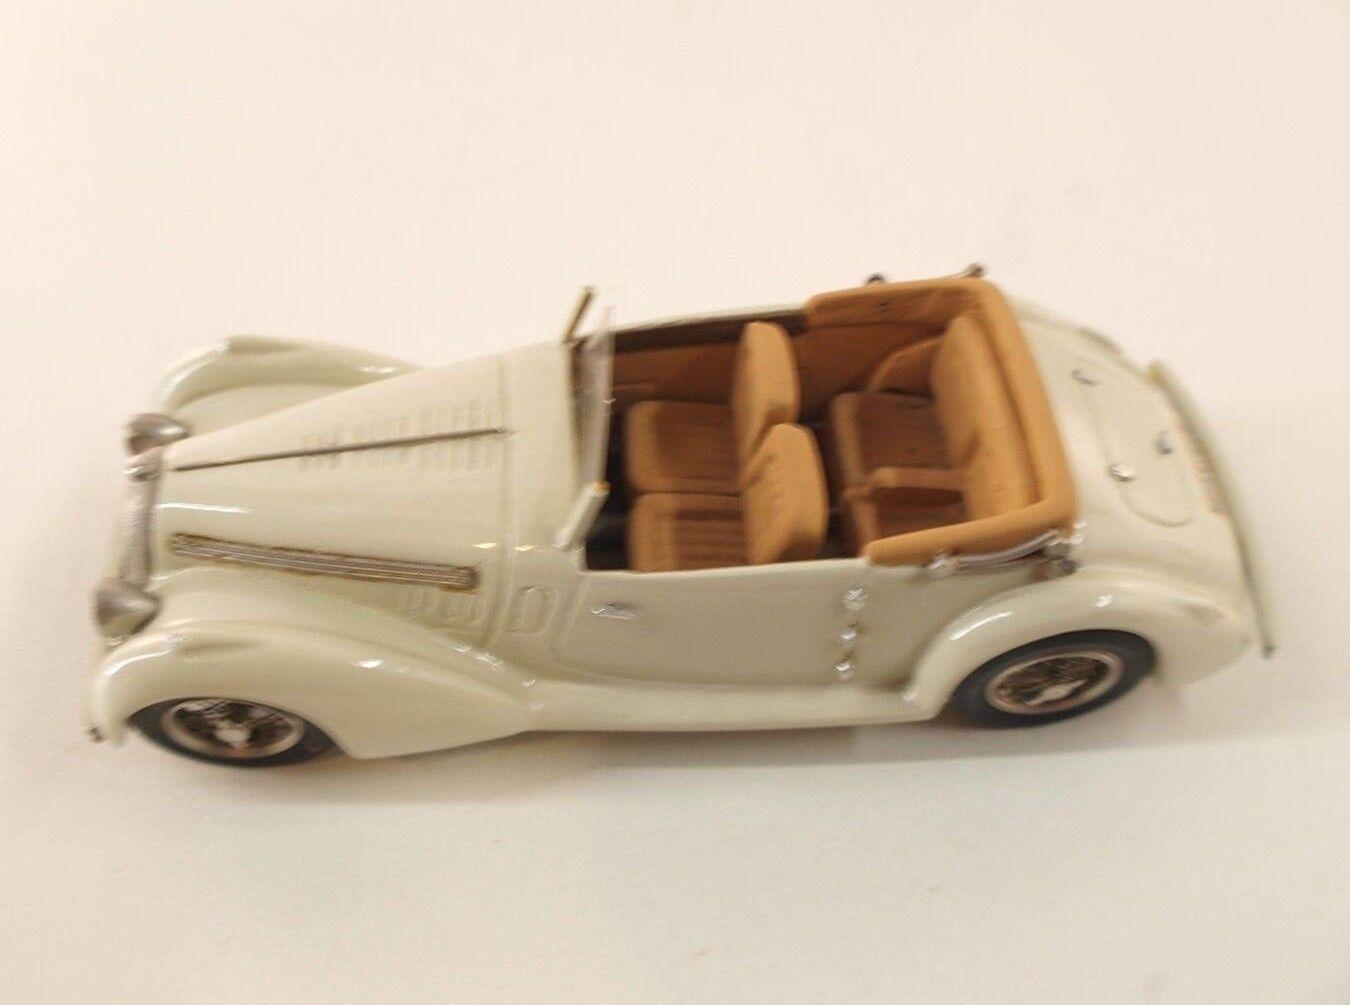 Ma Collection (Suisse)    n°6 TALBOT LAGO RECORD Cabriolet 1938 Lim Ed n°150 1/43   Magnifique  d5e6c5